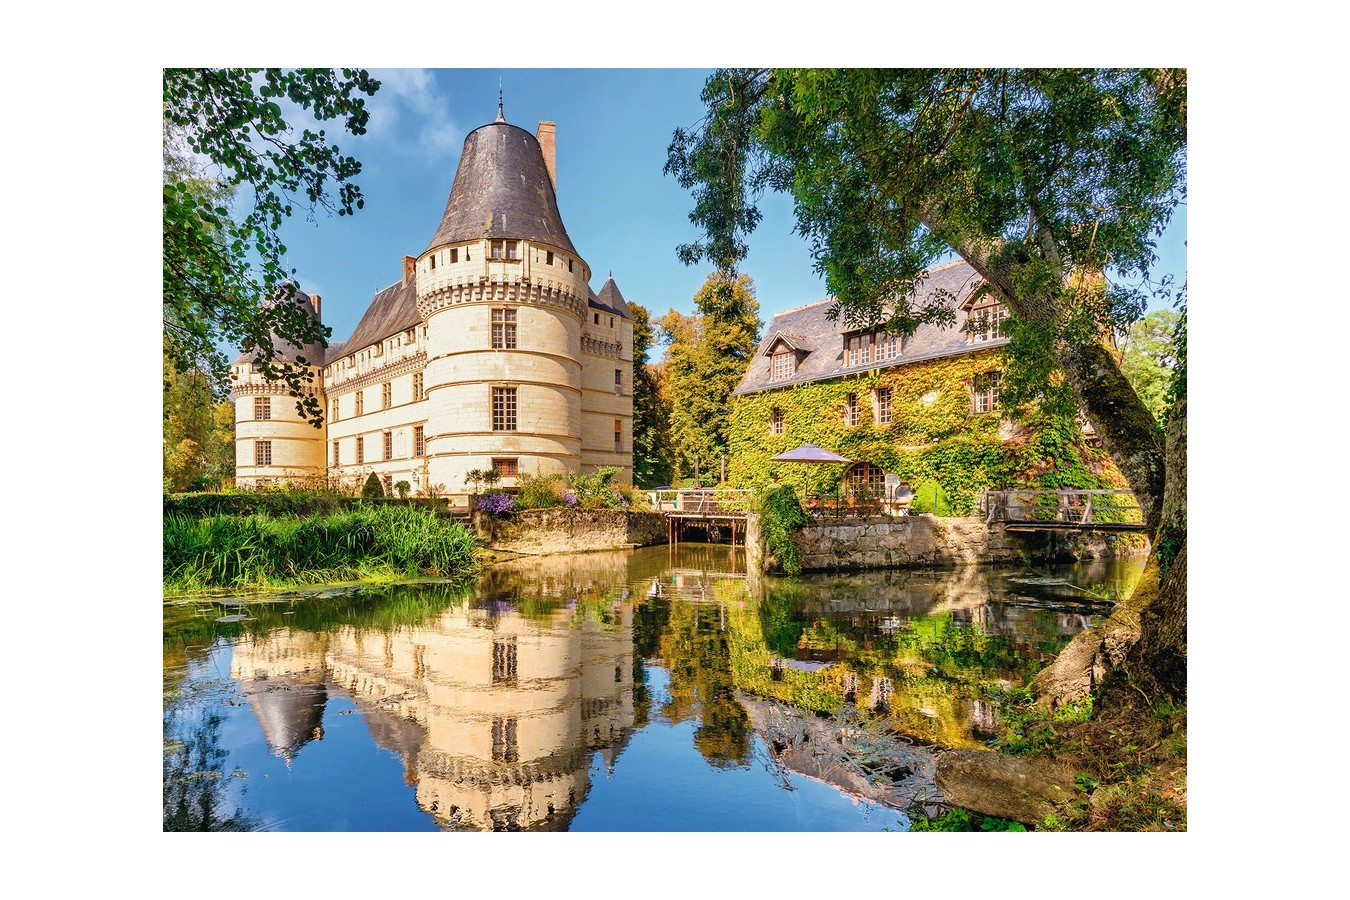 Puzzle Ravensburger - Castelul Islette, 500 piese (13650)